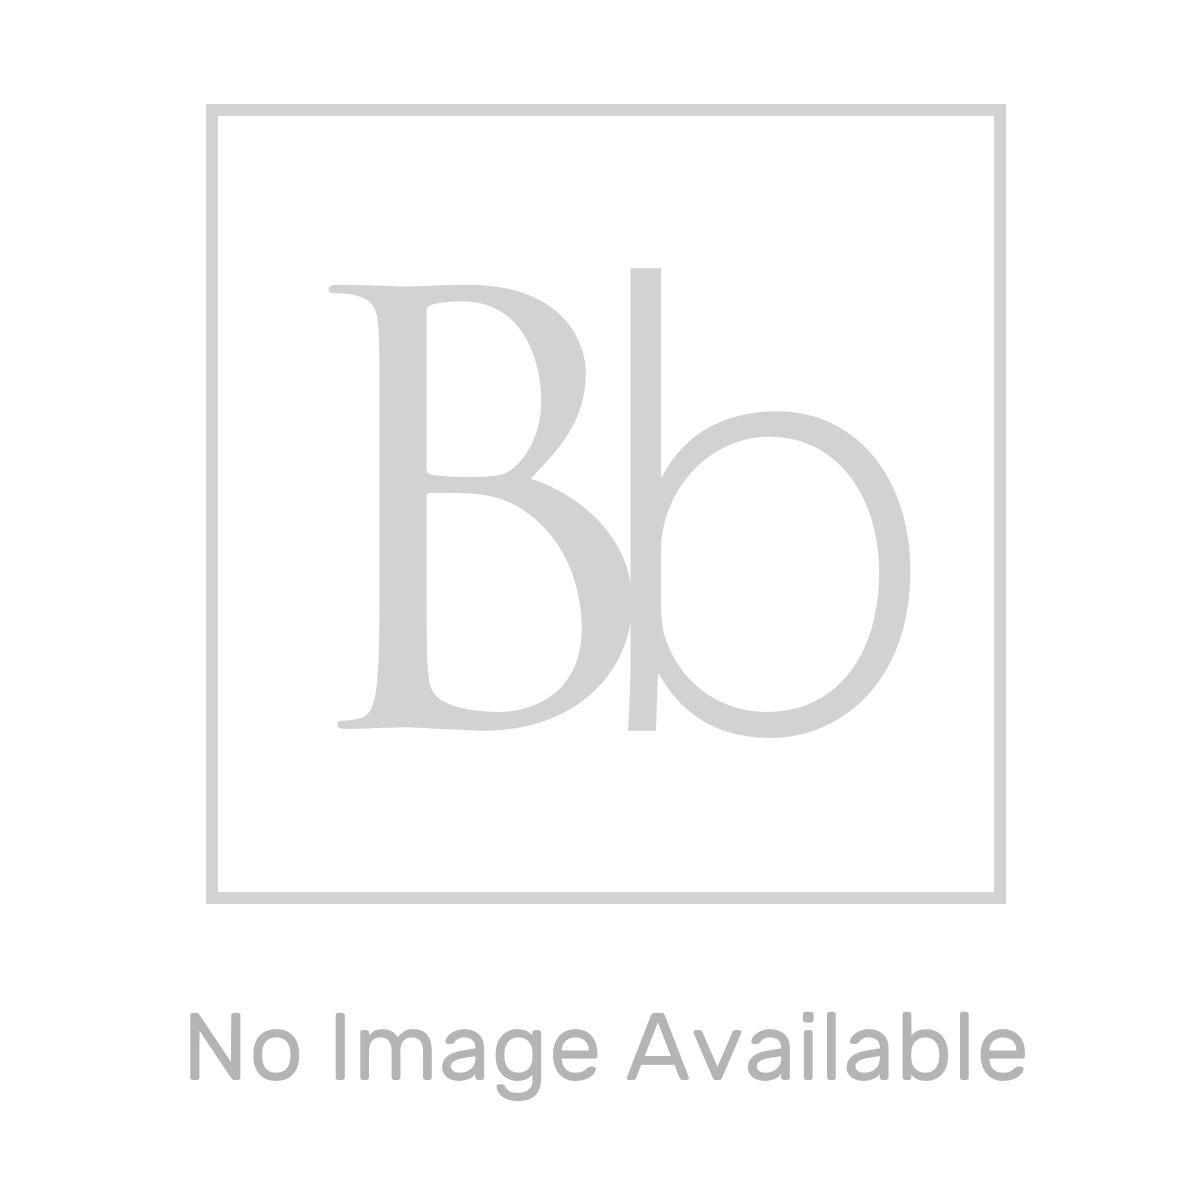 Triton Aspirante White Gloss Electric Shower in Situation